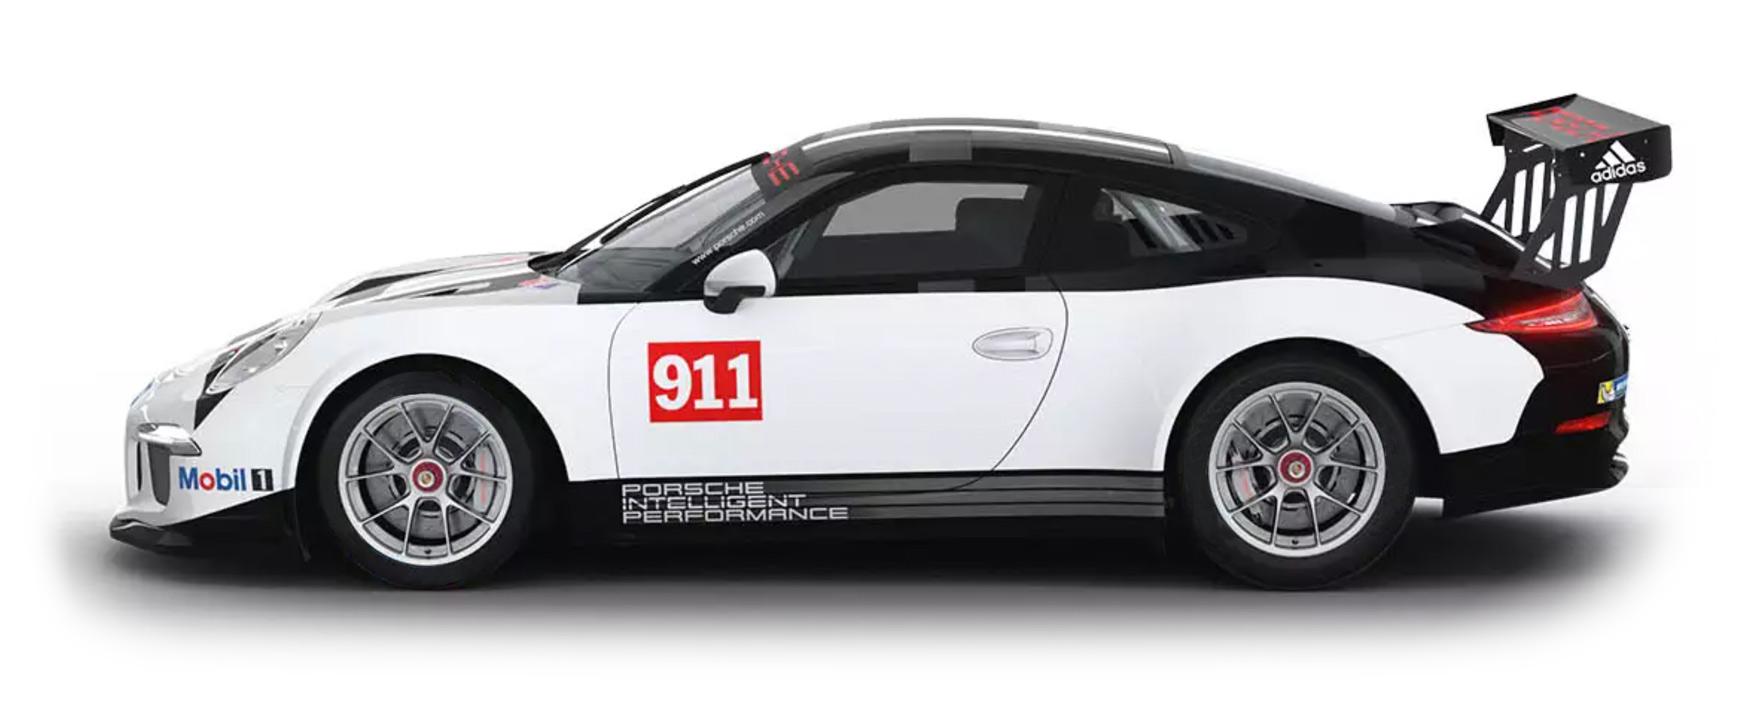 Porsche Sprint Challenge North America Gold Class car